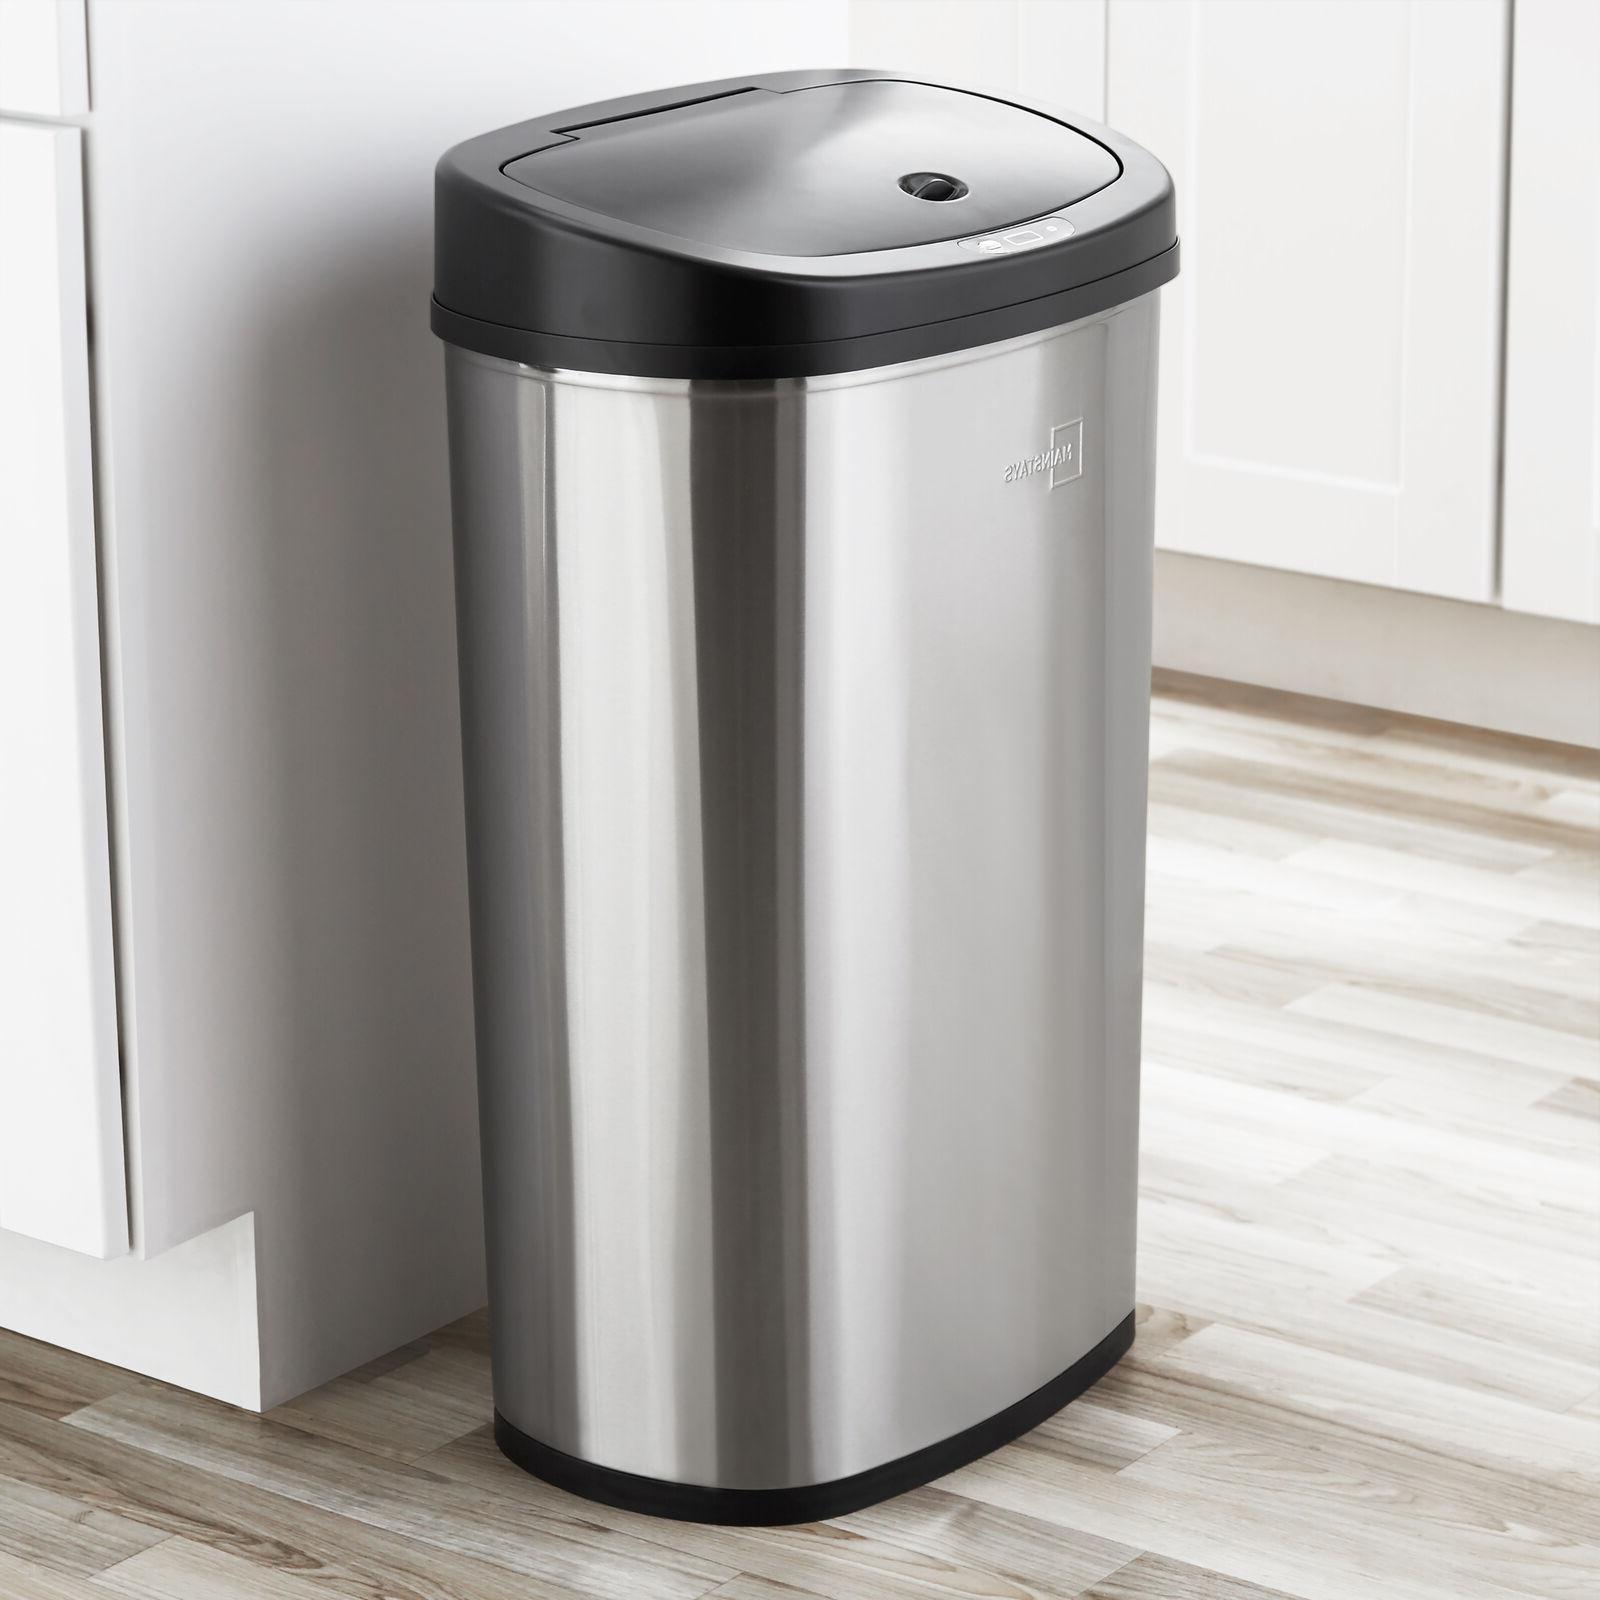 Trash Can Motion Sensor 13 Gal Stainless Steel Kitchen Garba